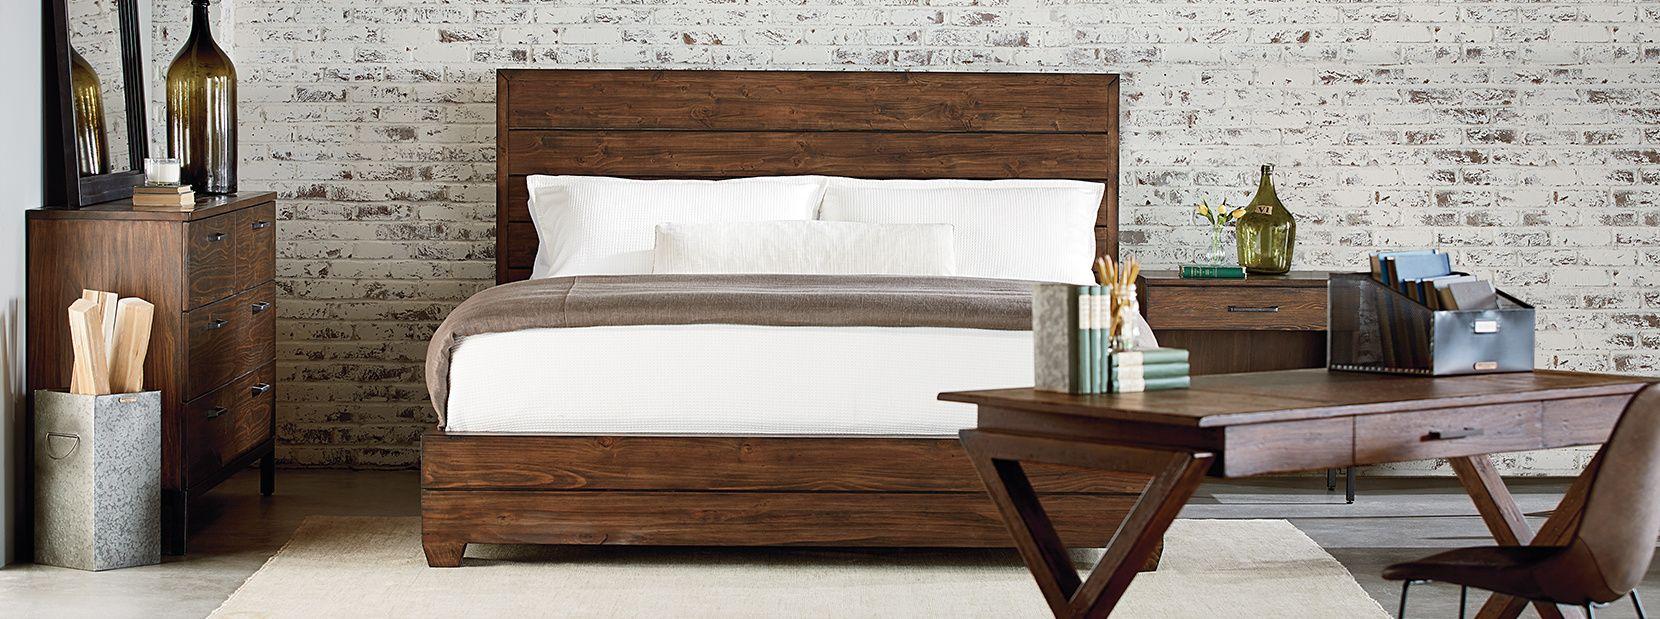 Magnolia Home Collection by Joanna Gaines - Industrial   Art Van Furniture  · Rustic BedroomsMagnolia ...